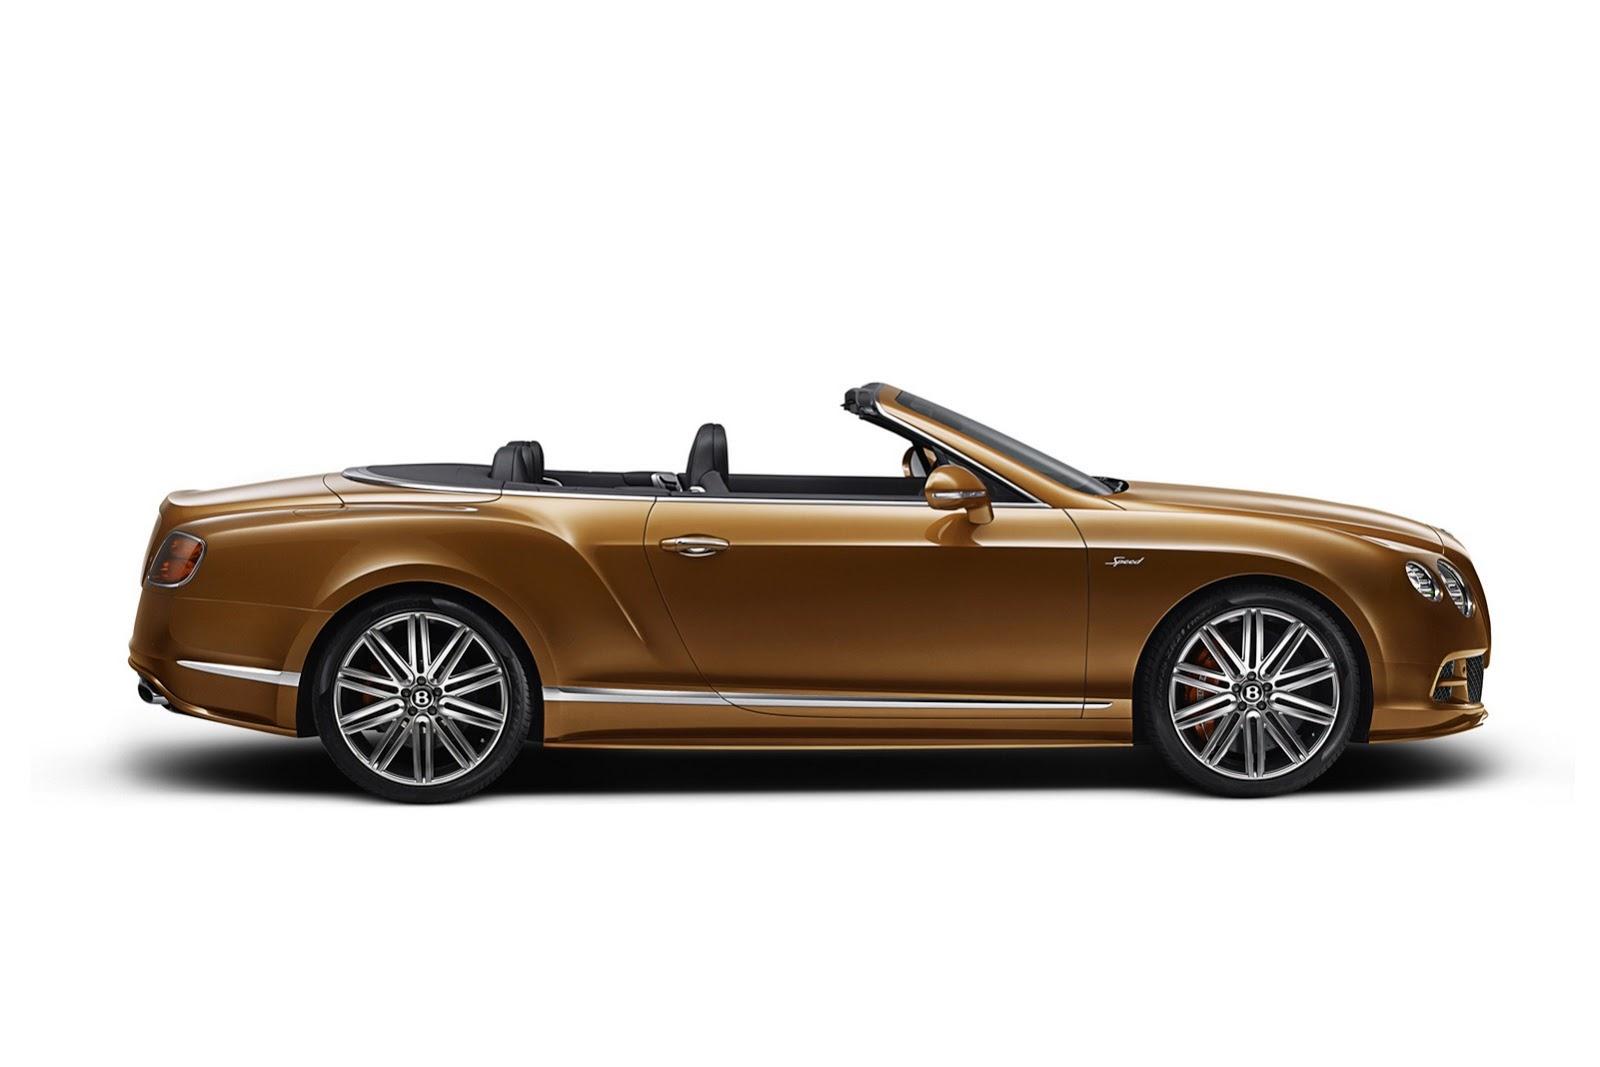 bentley continental gt speed m y 2014 coup convertible bentley autopareri. Black Bedroom Furniture Sets. Home Design Ideas